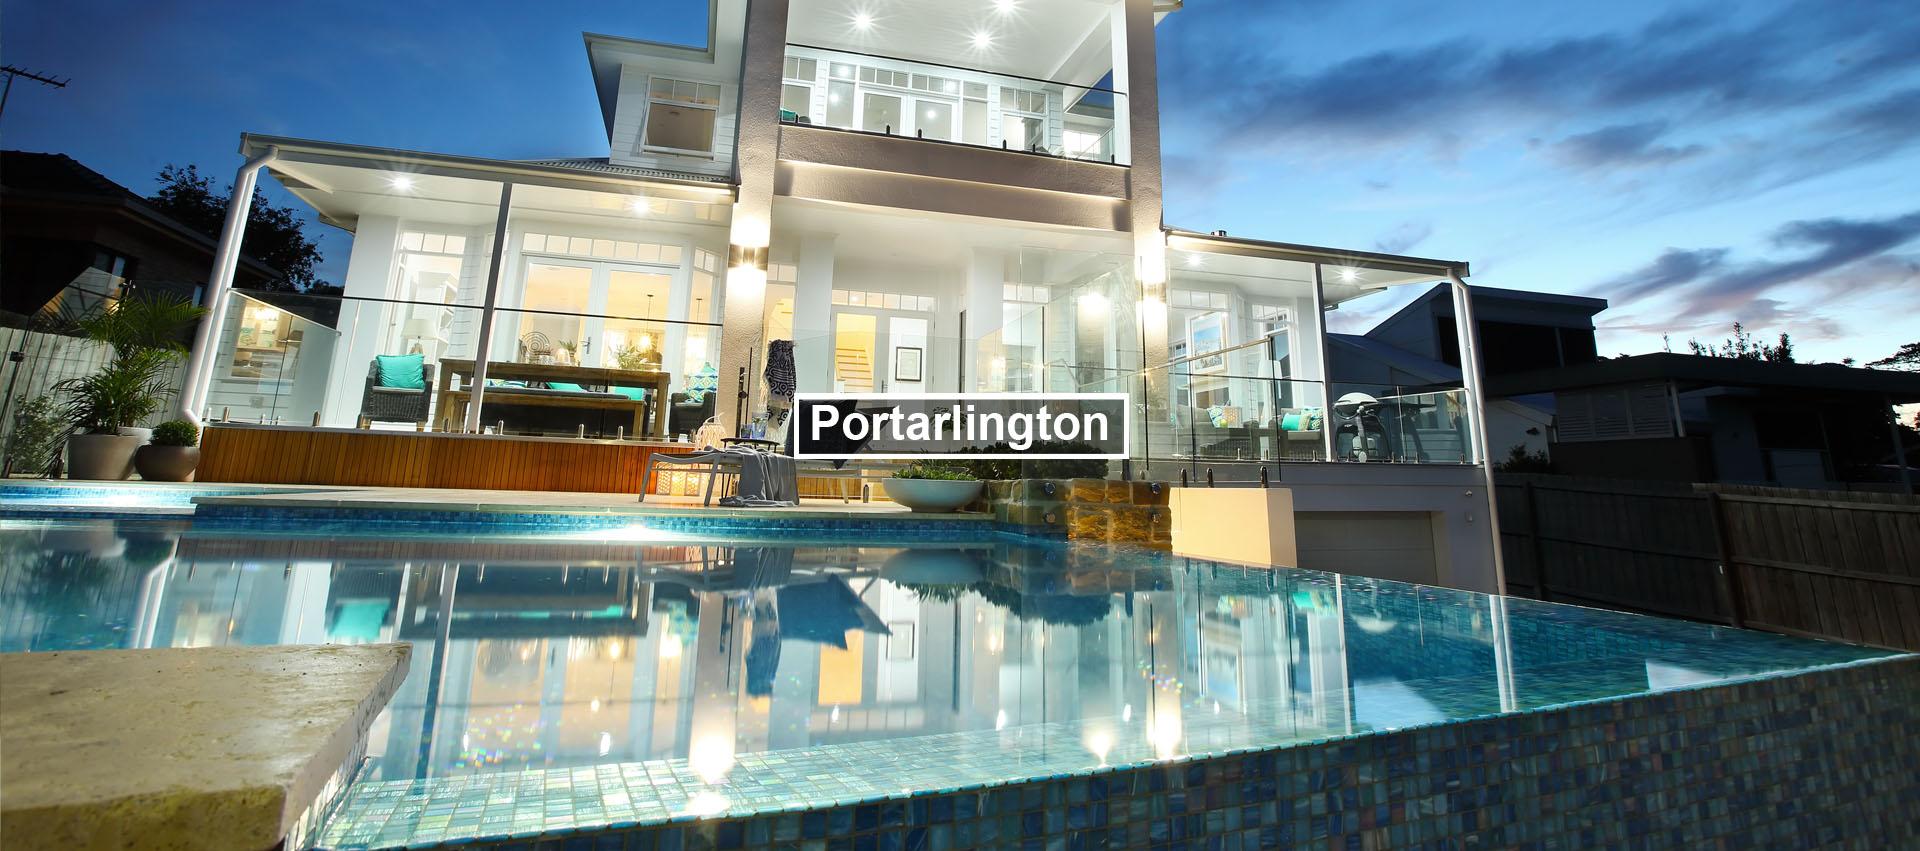 Portarlington - Kiama Pools Swimming Pool Project